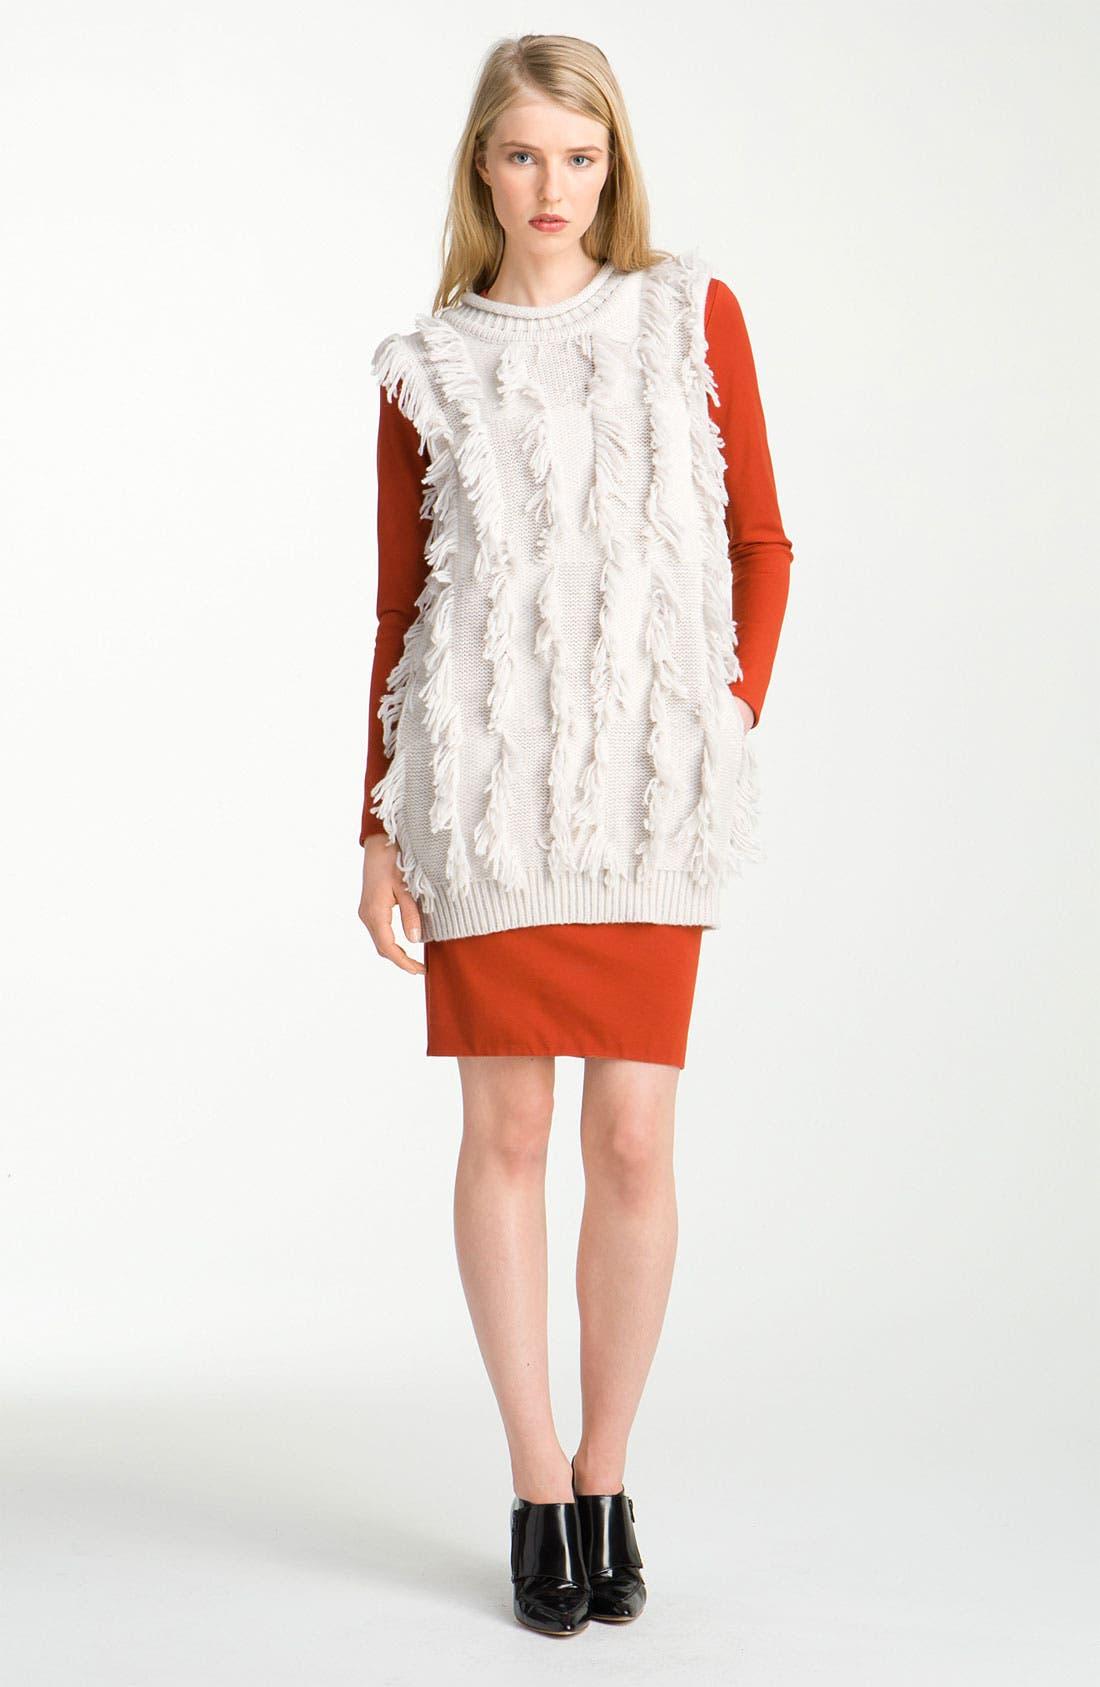 Main Image - 3.1 Phillip Lim Fringe Intarsia Tunic Sweater